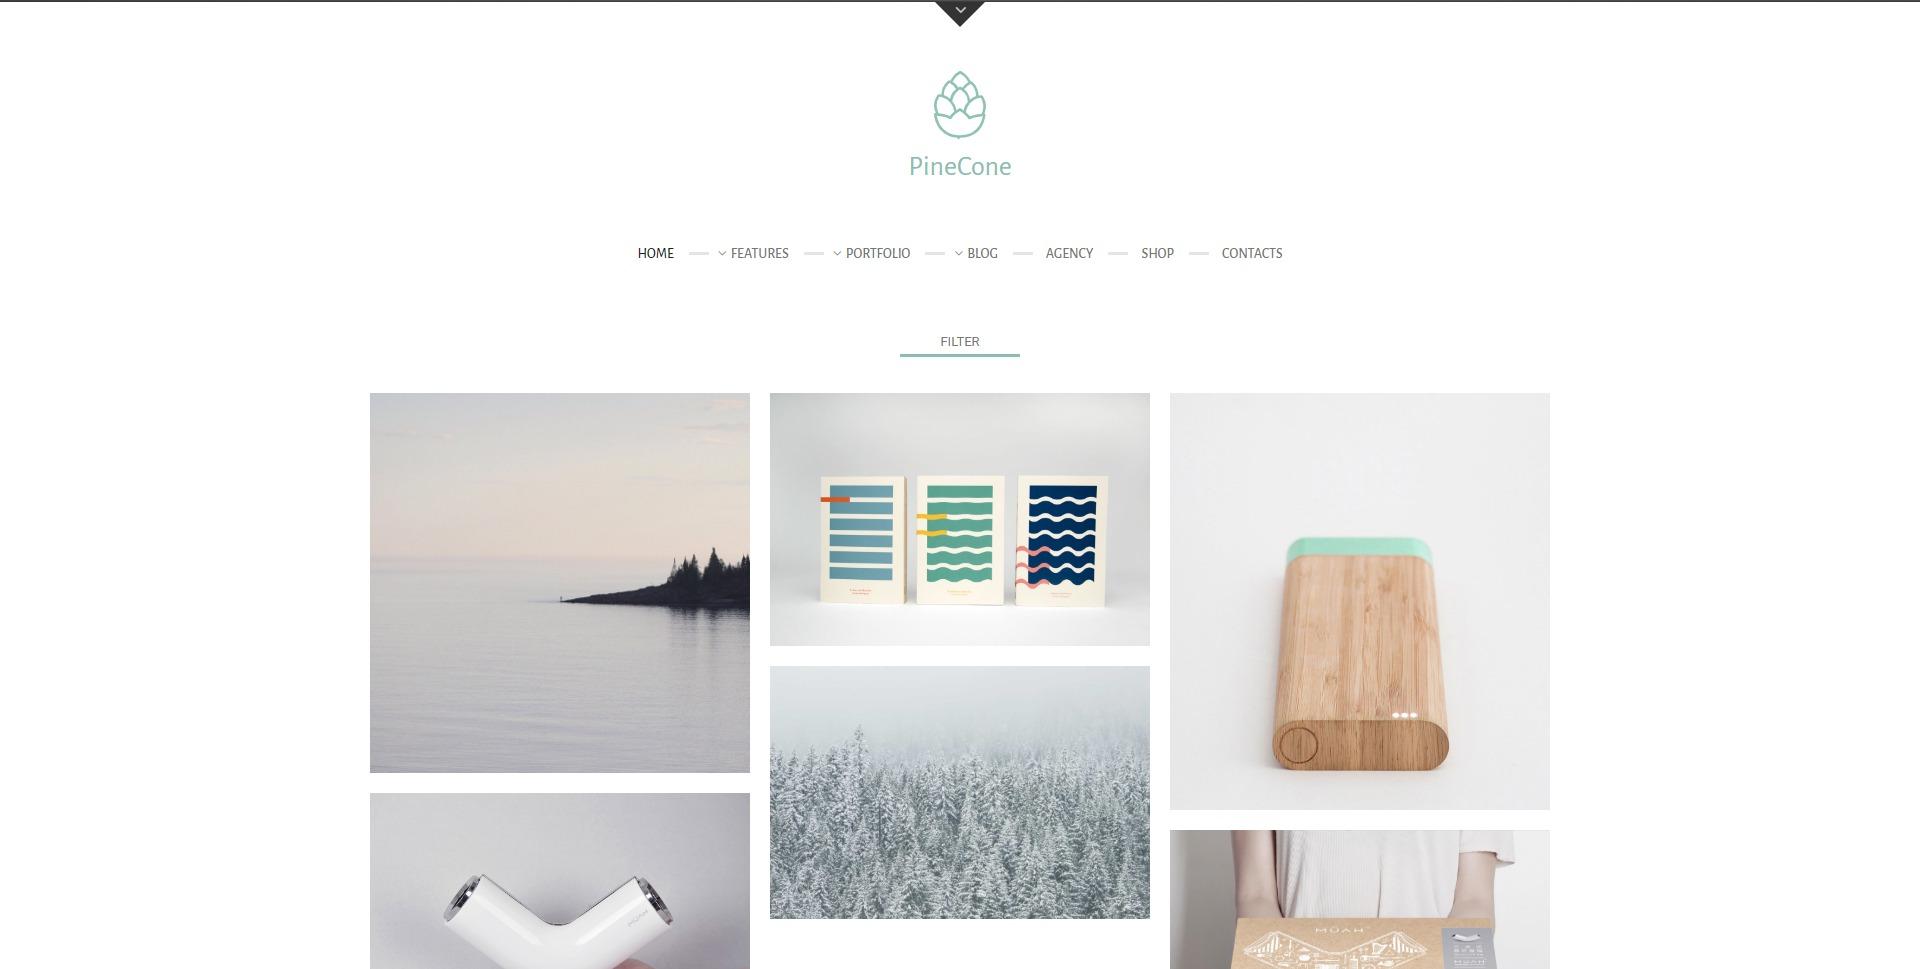 PineCone-无限加载创意作品展示WordPress主题